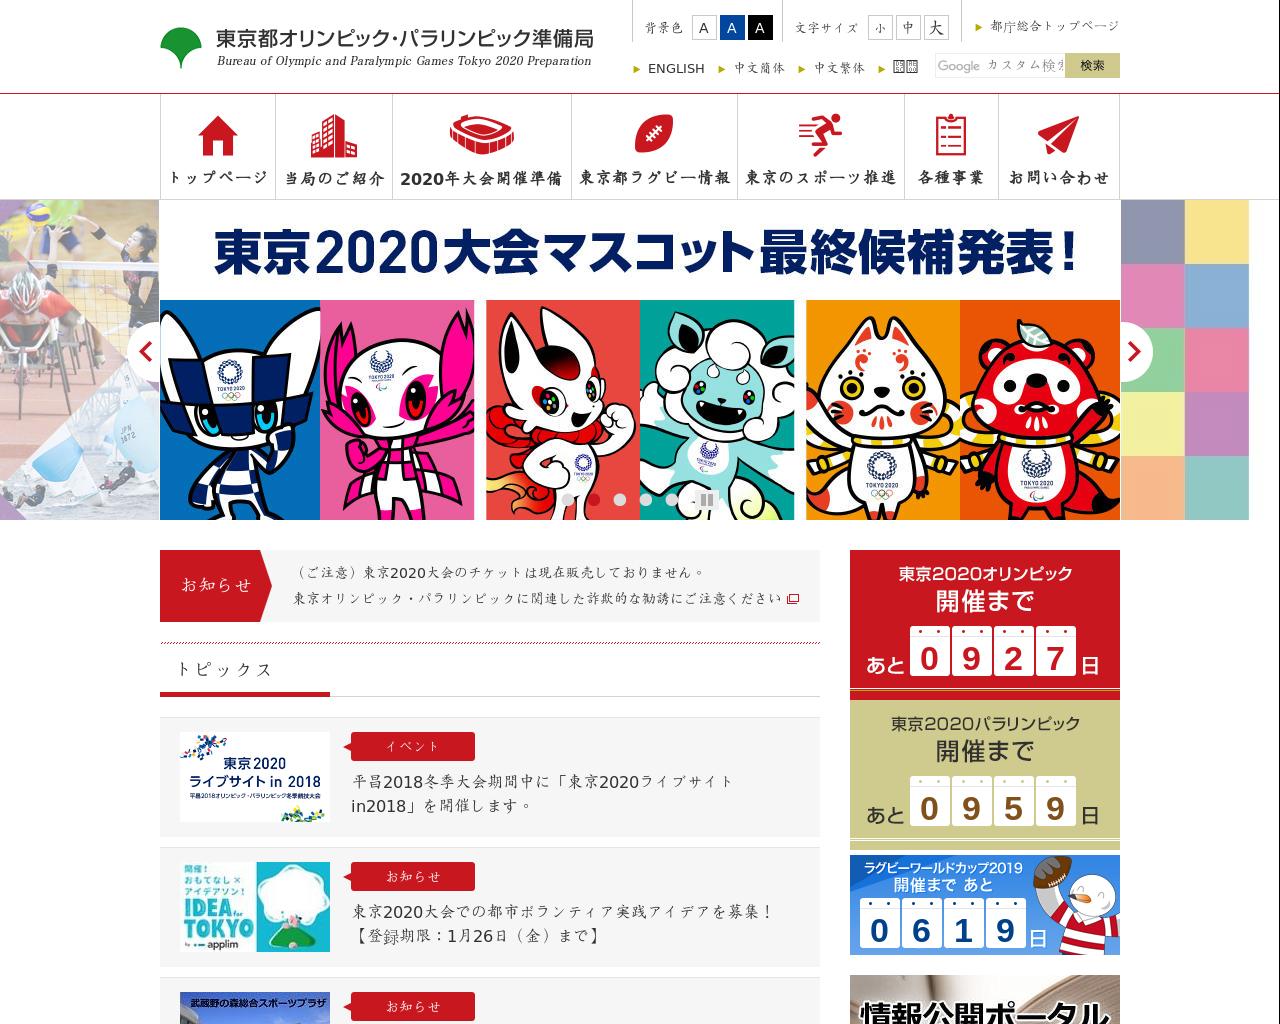 www.2020games.metro.tokyo.jp(2018/01/10 07:10:40)